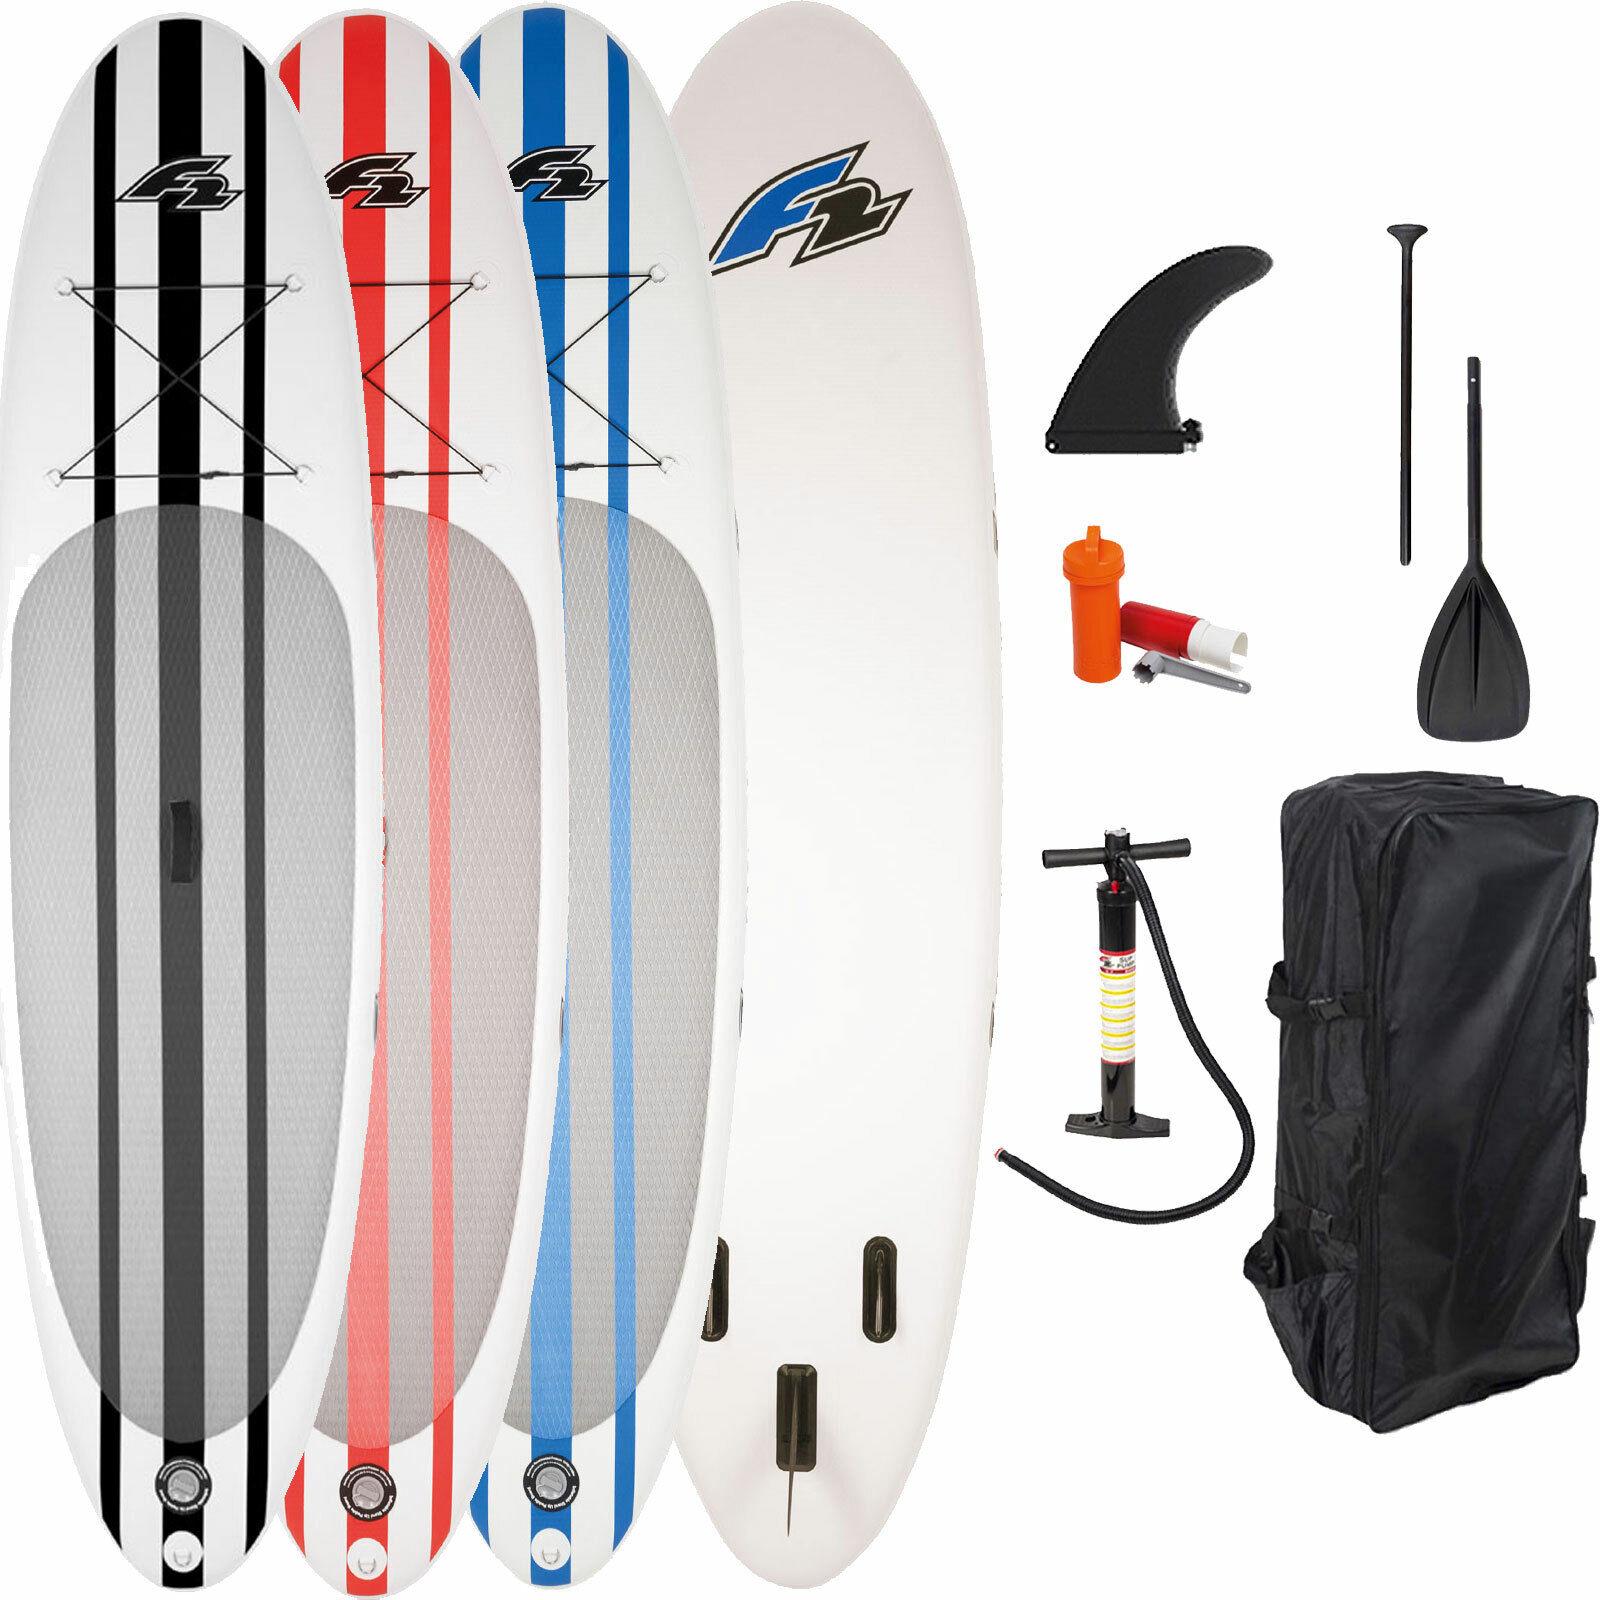 F2 Inflatable Basic Pro I-SUP Stand Up Paddle Board SET Paddleboard Surfbrett